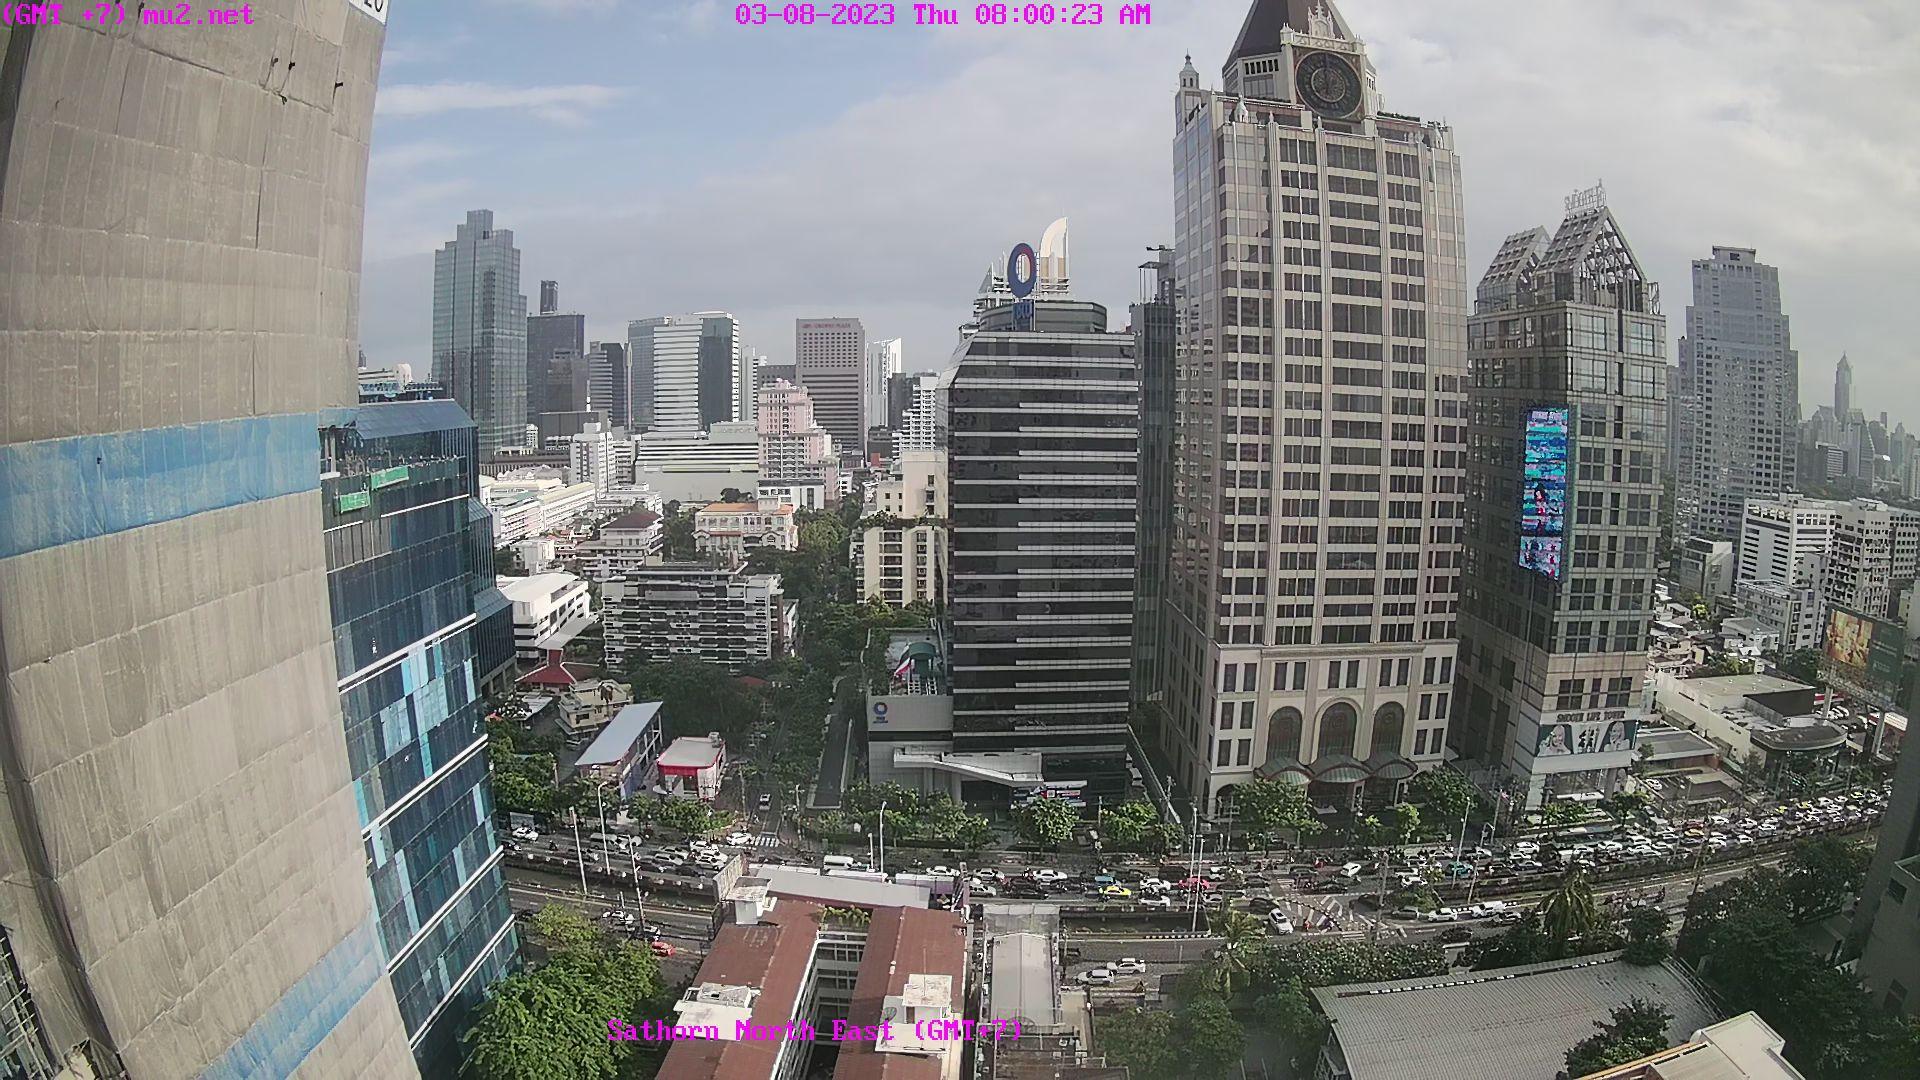 Bangkok Mon. 08:09